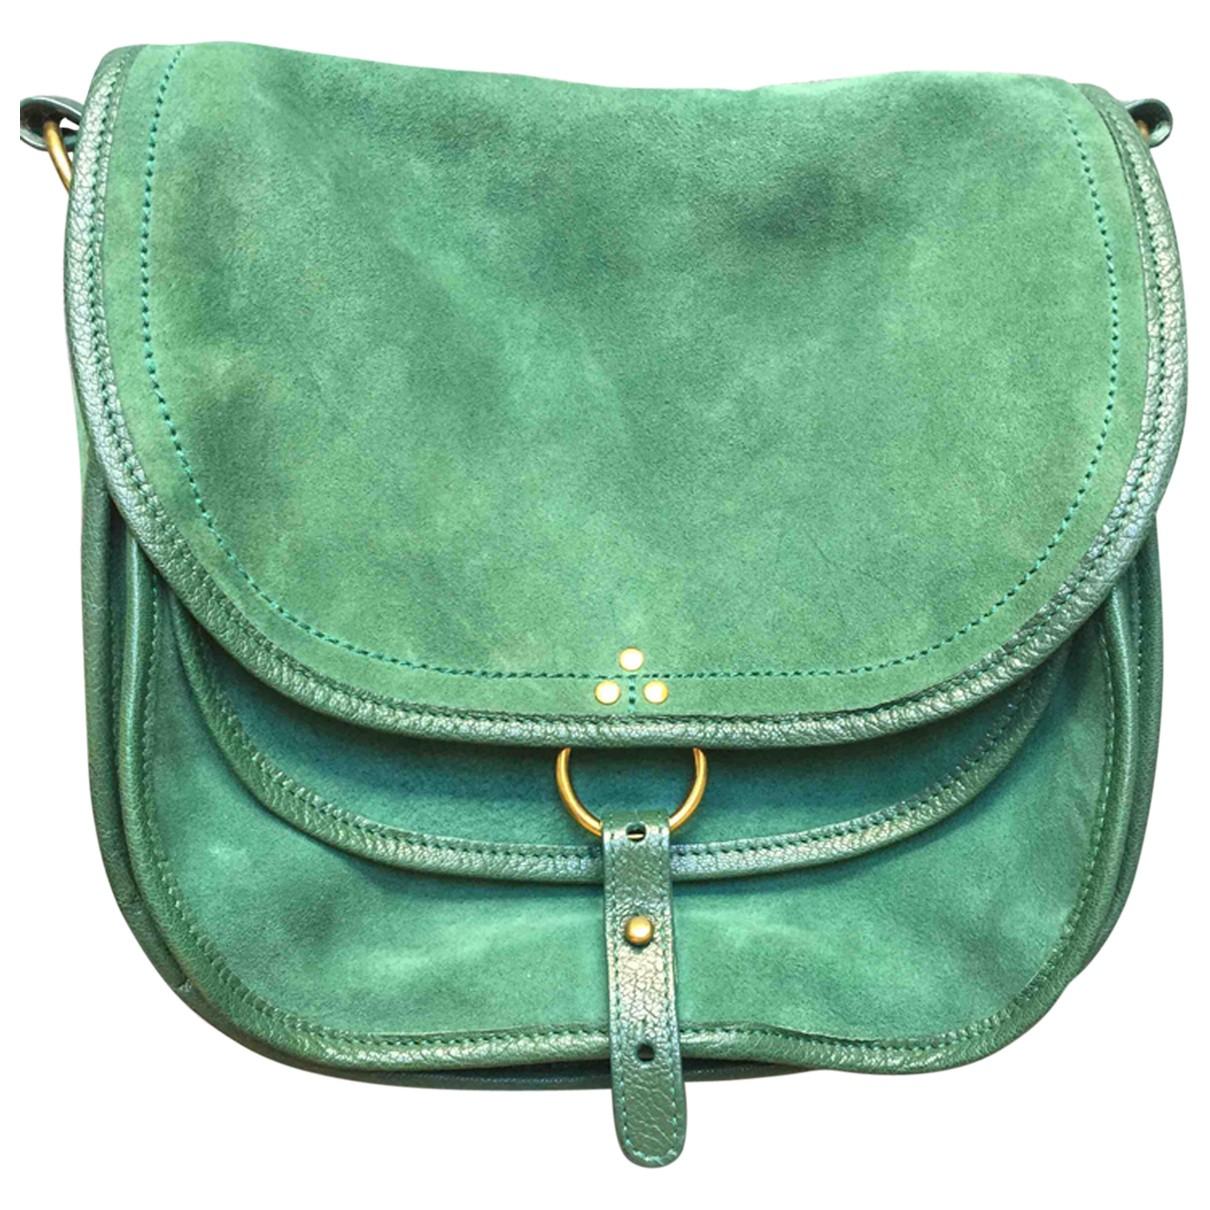 Jerome Dreyfuss N Green Suede handbag for Women N